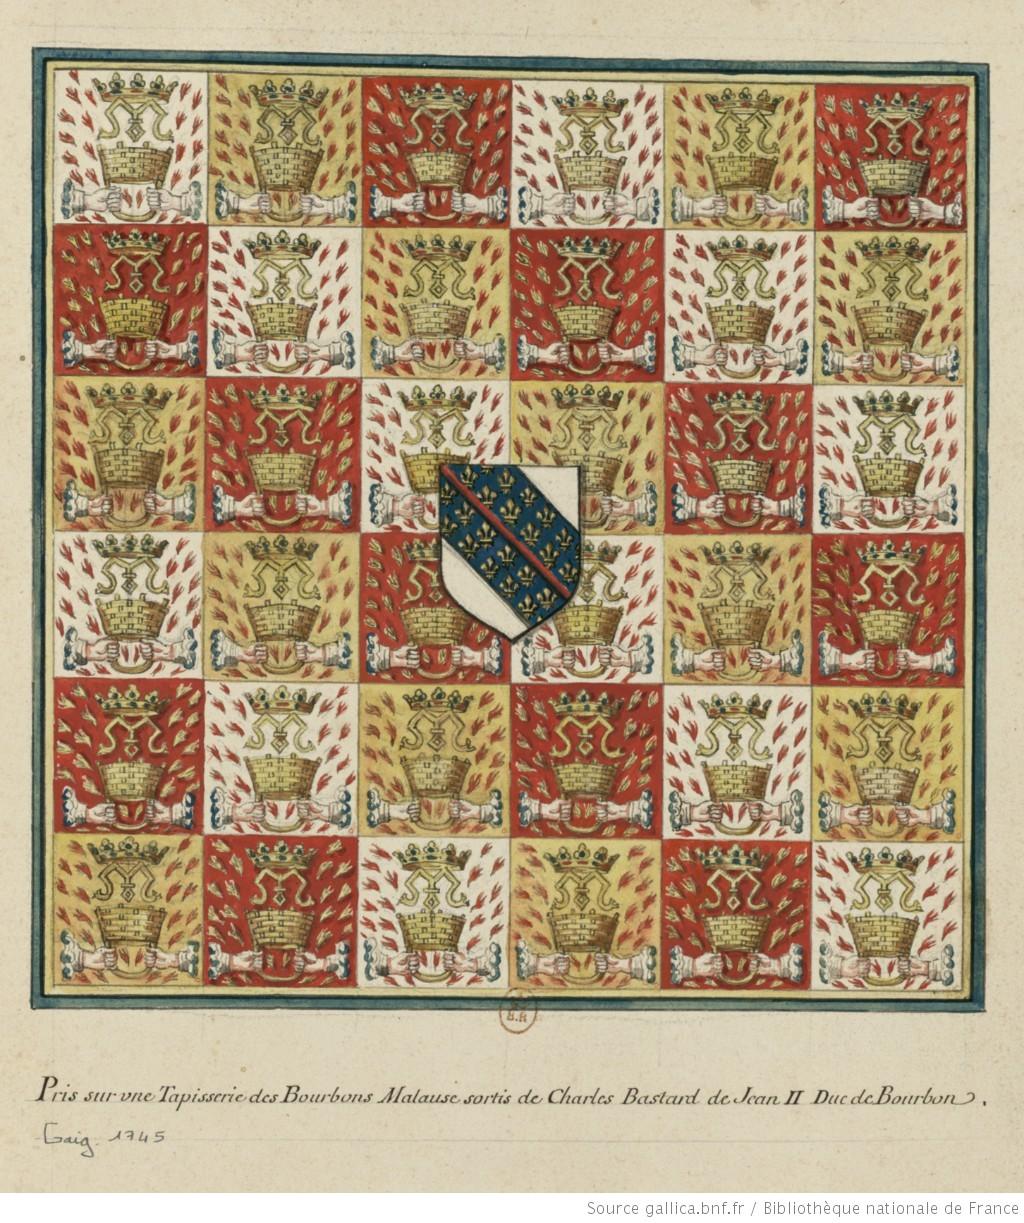 Armoiries de Charles, bâtard de Jean II de Bourbon, bâtard.